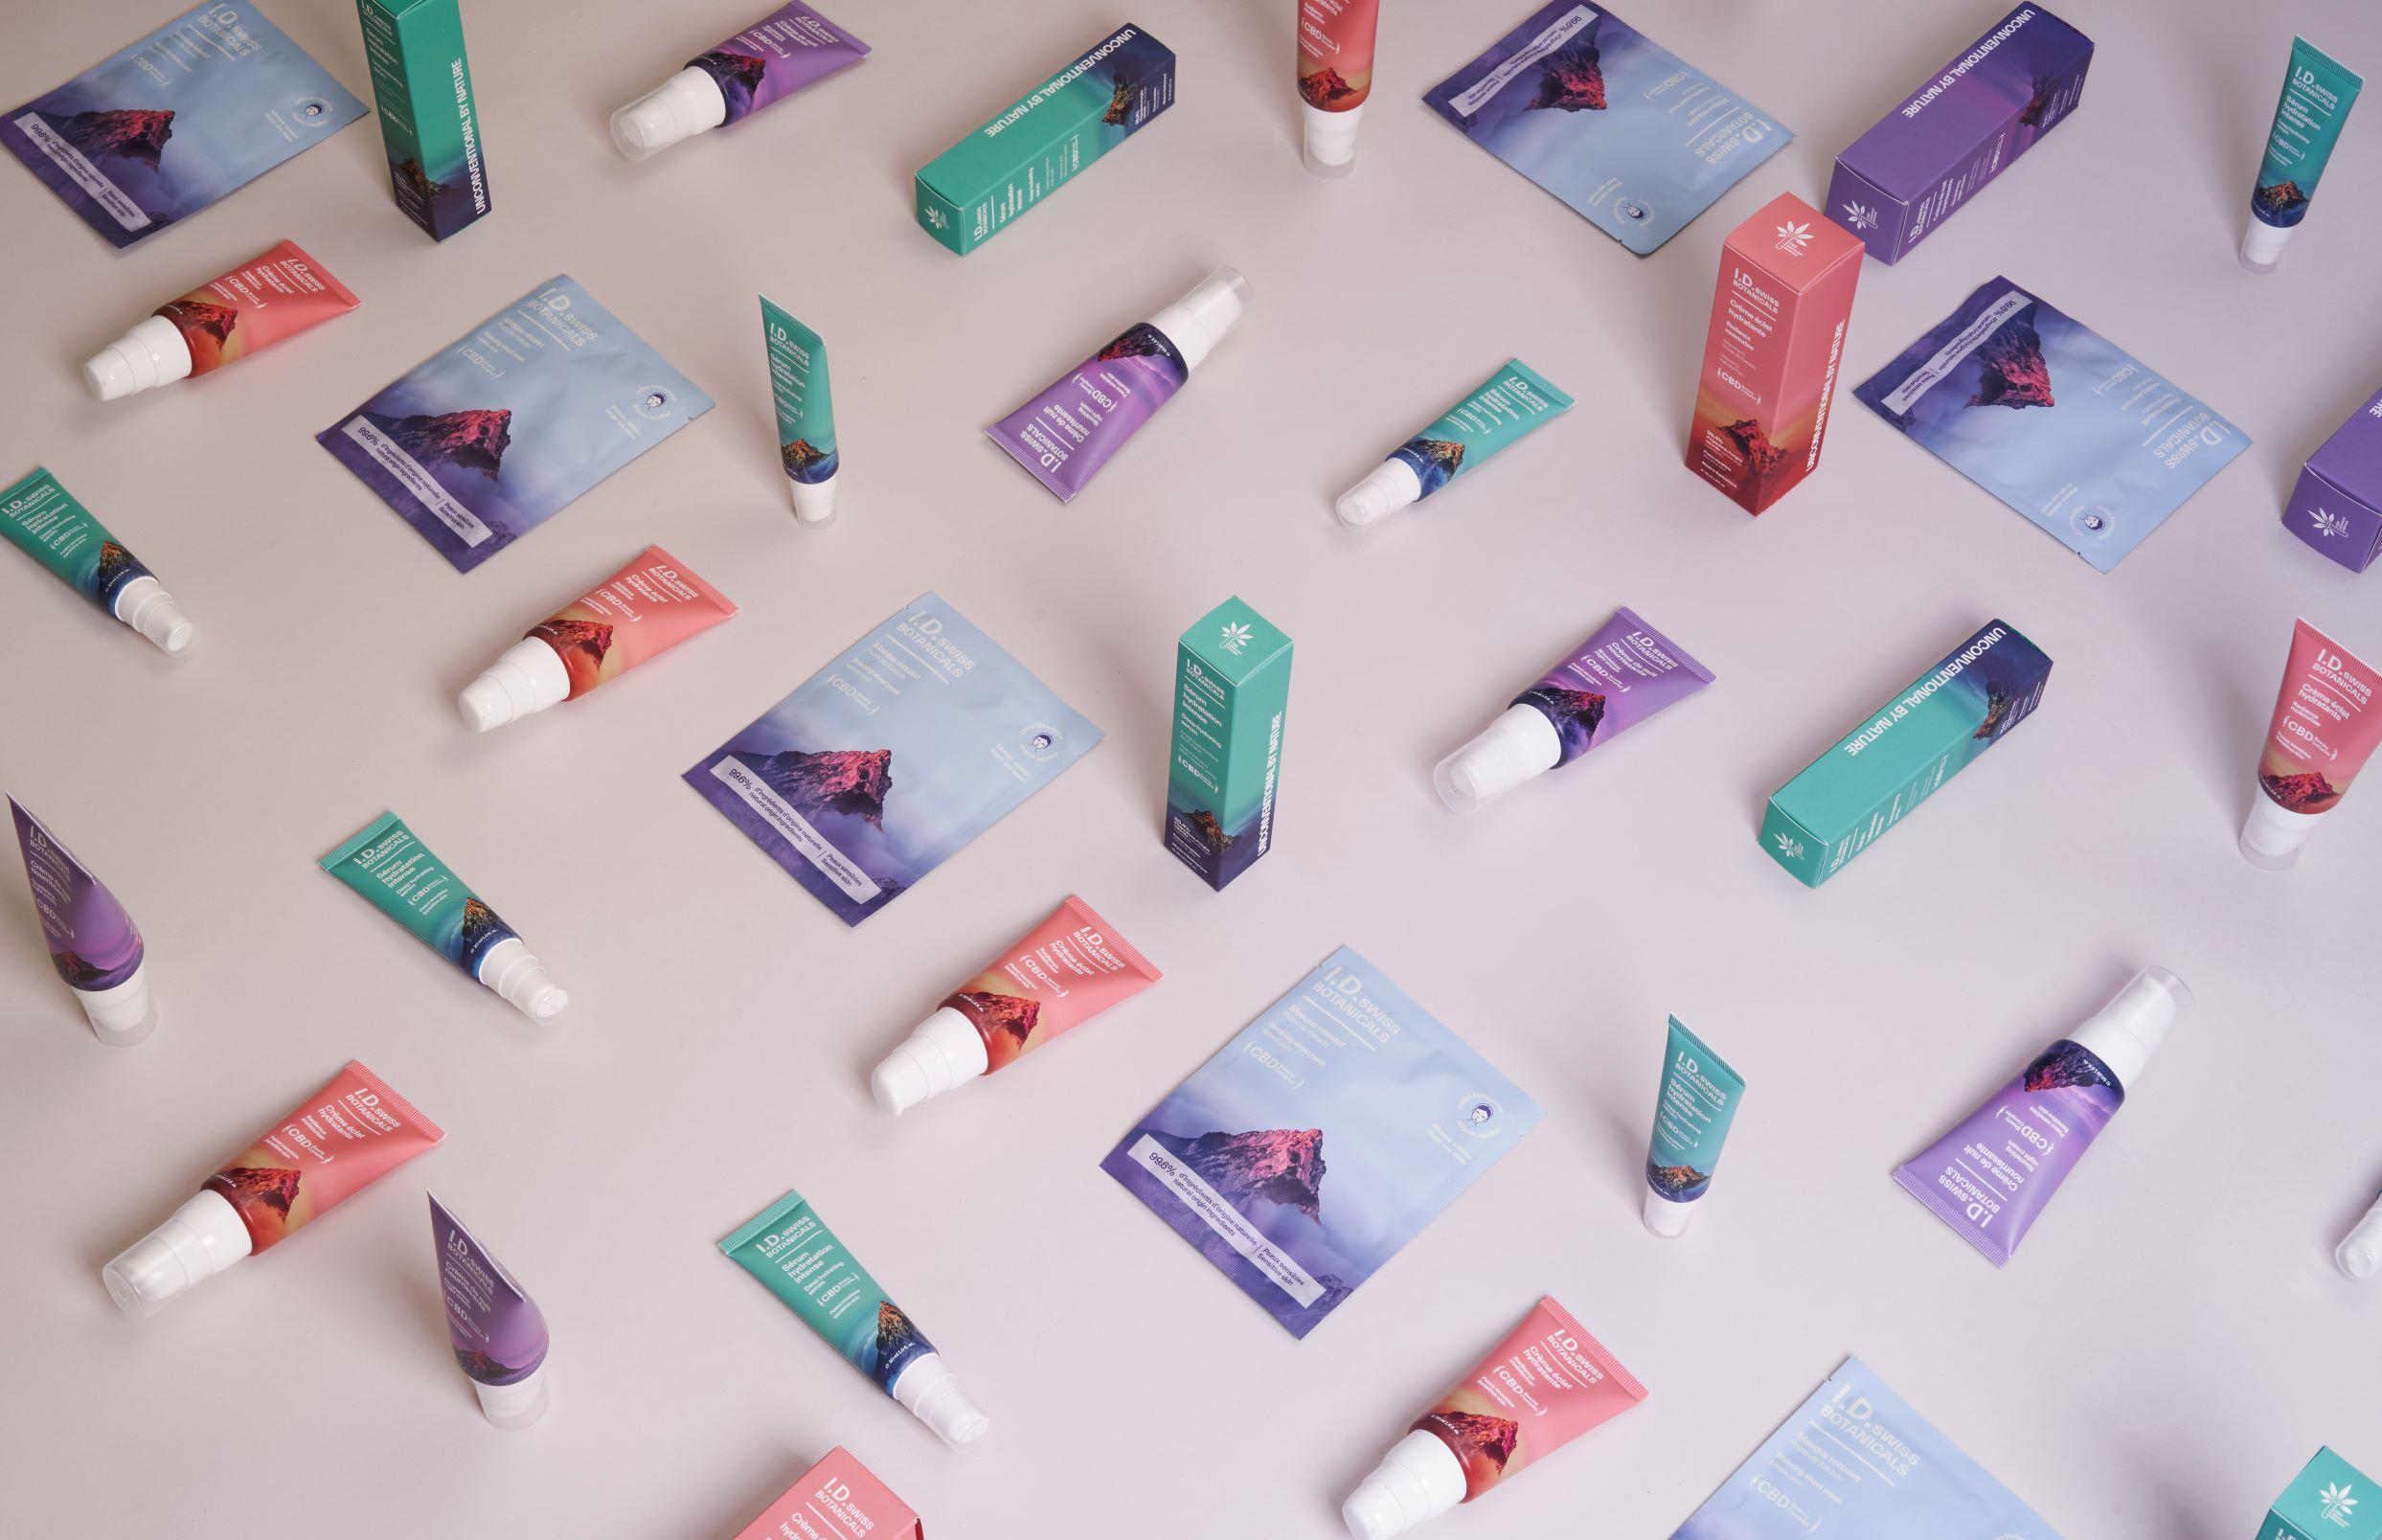 'Skinminimalism' strips beauty back to the bare minimum